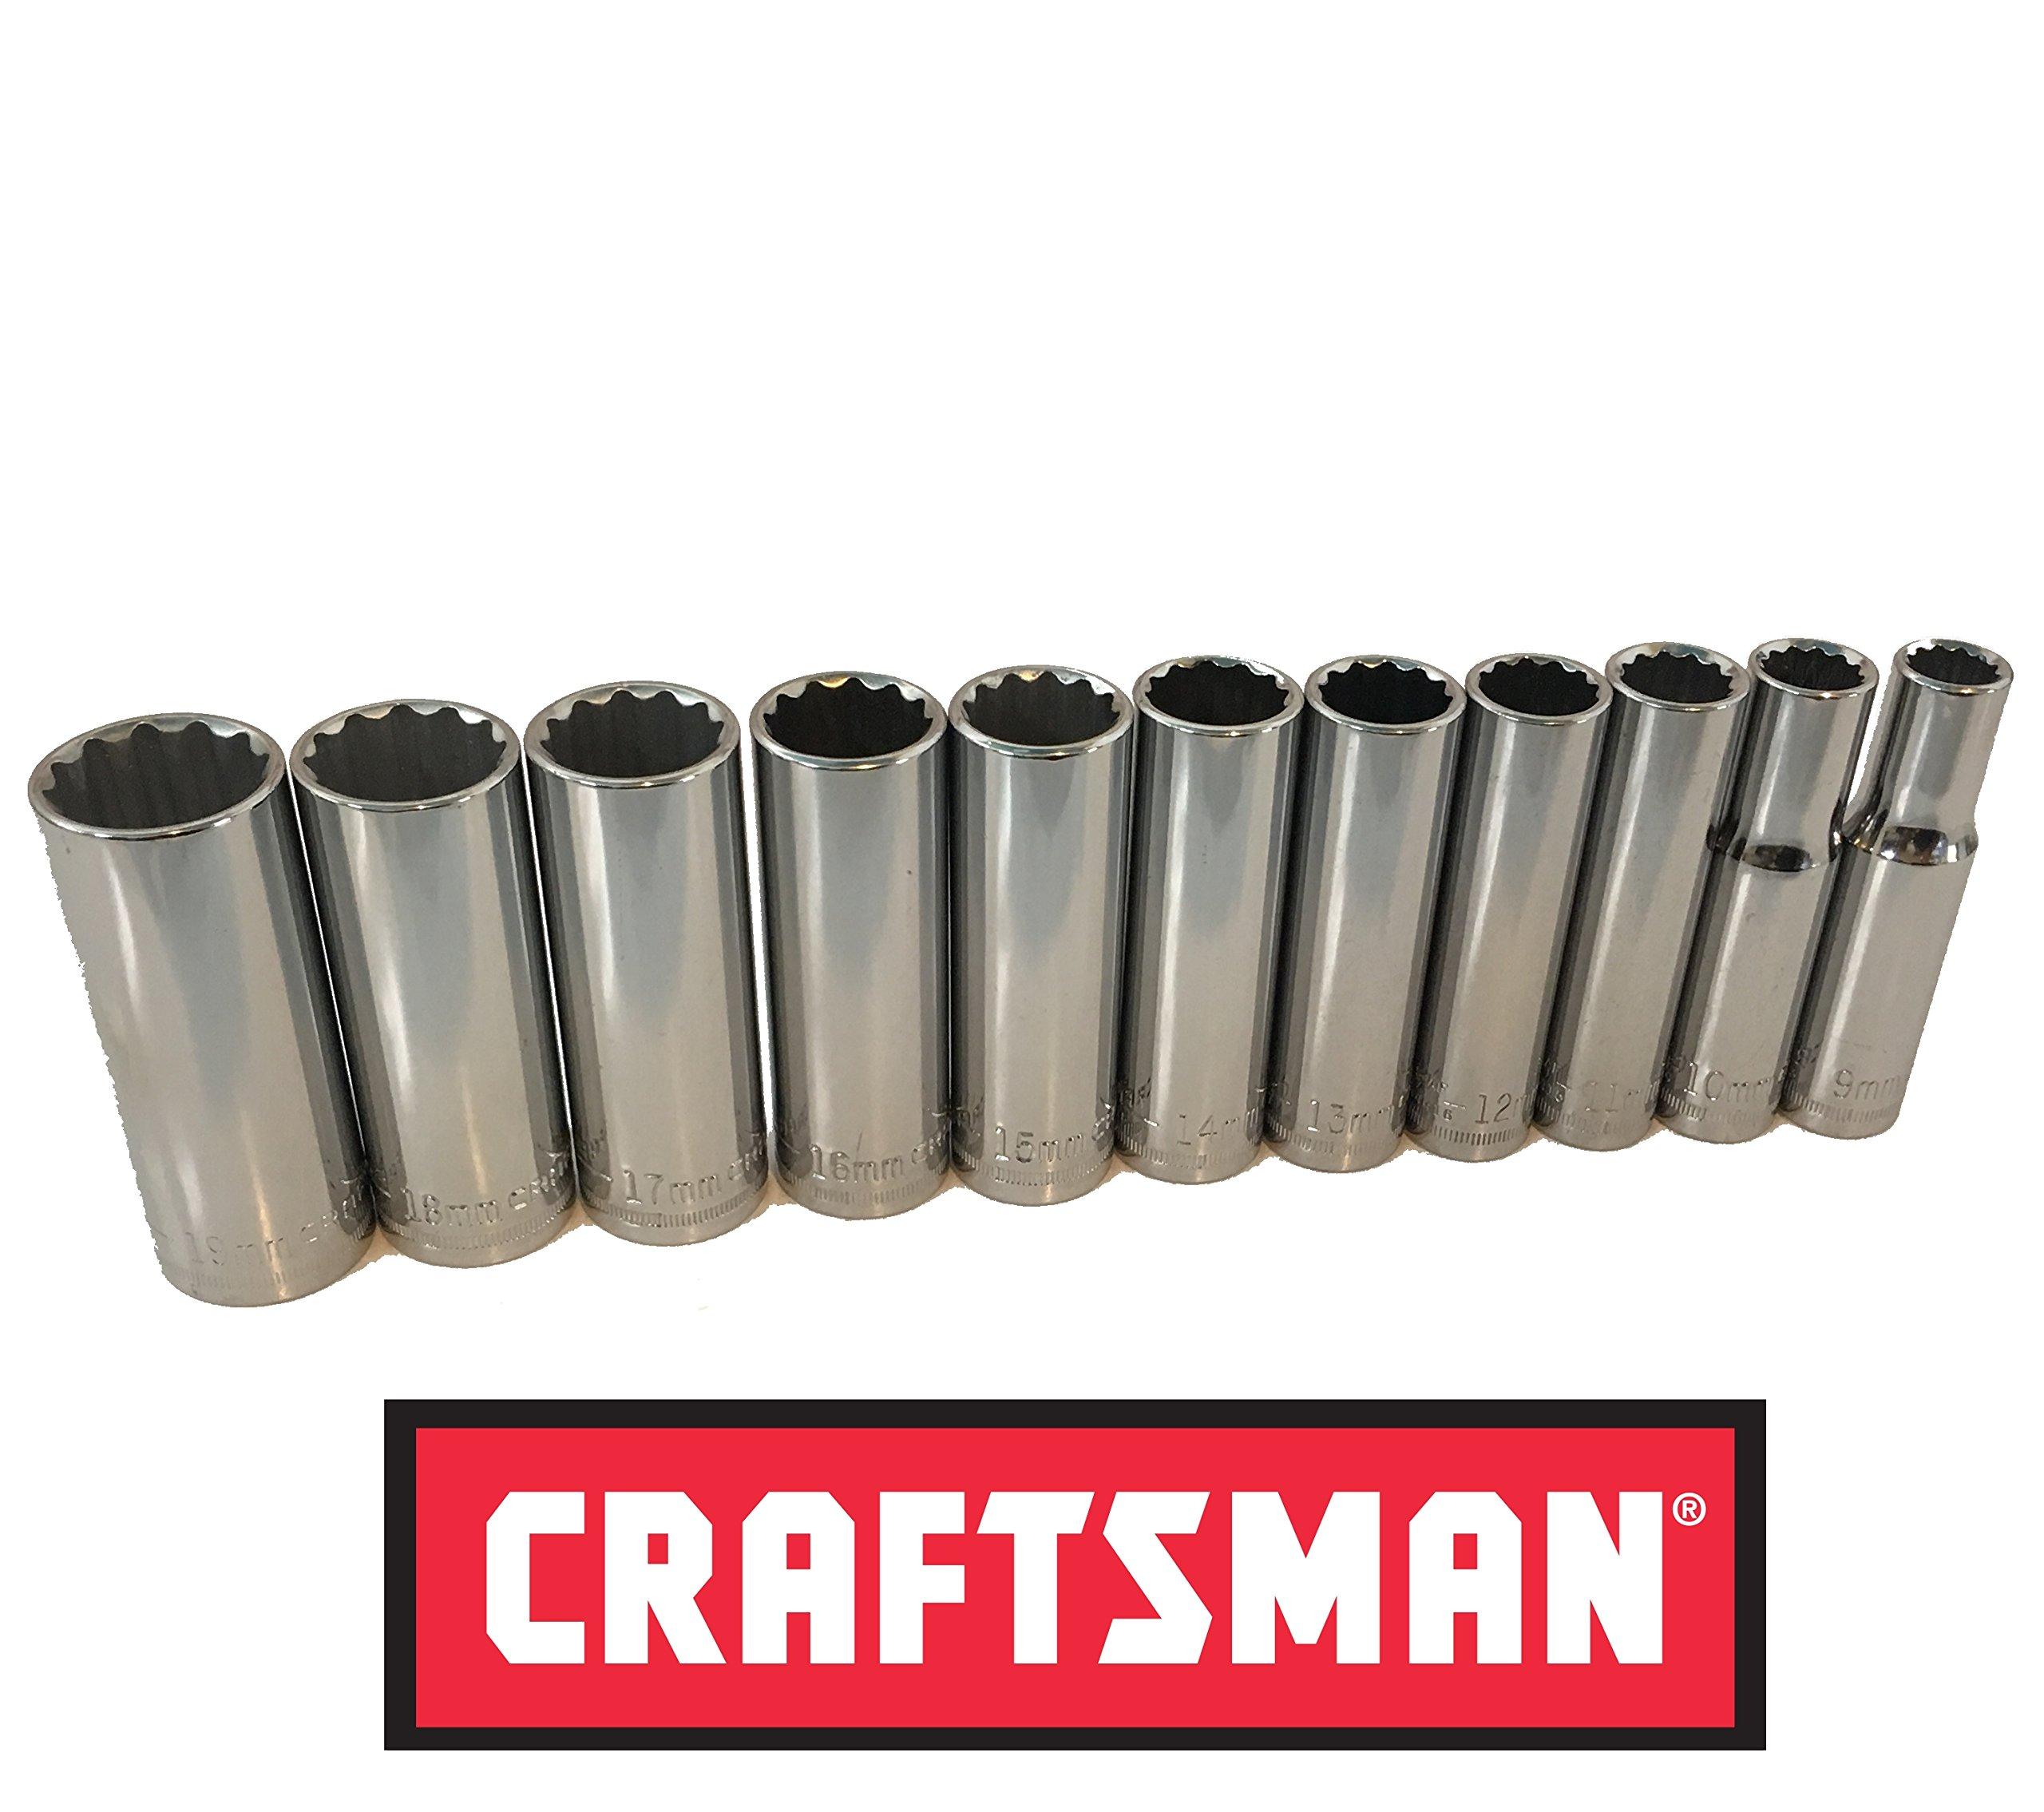 Craftsman 3/8'' Drive 11 Piece 12 Pt Point Metric MM Deep Socket Set